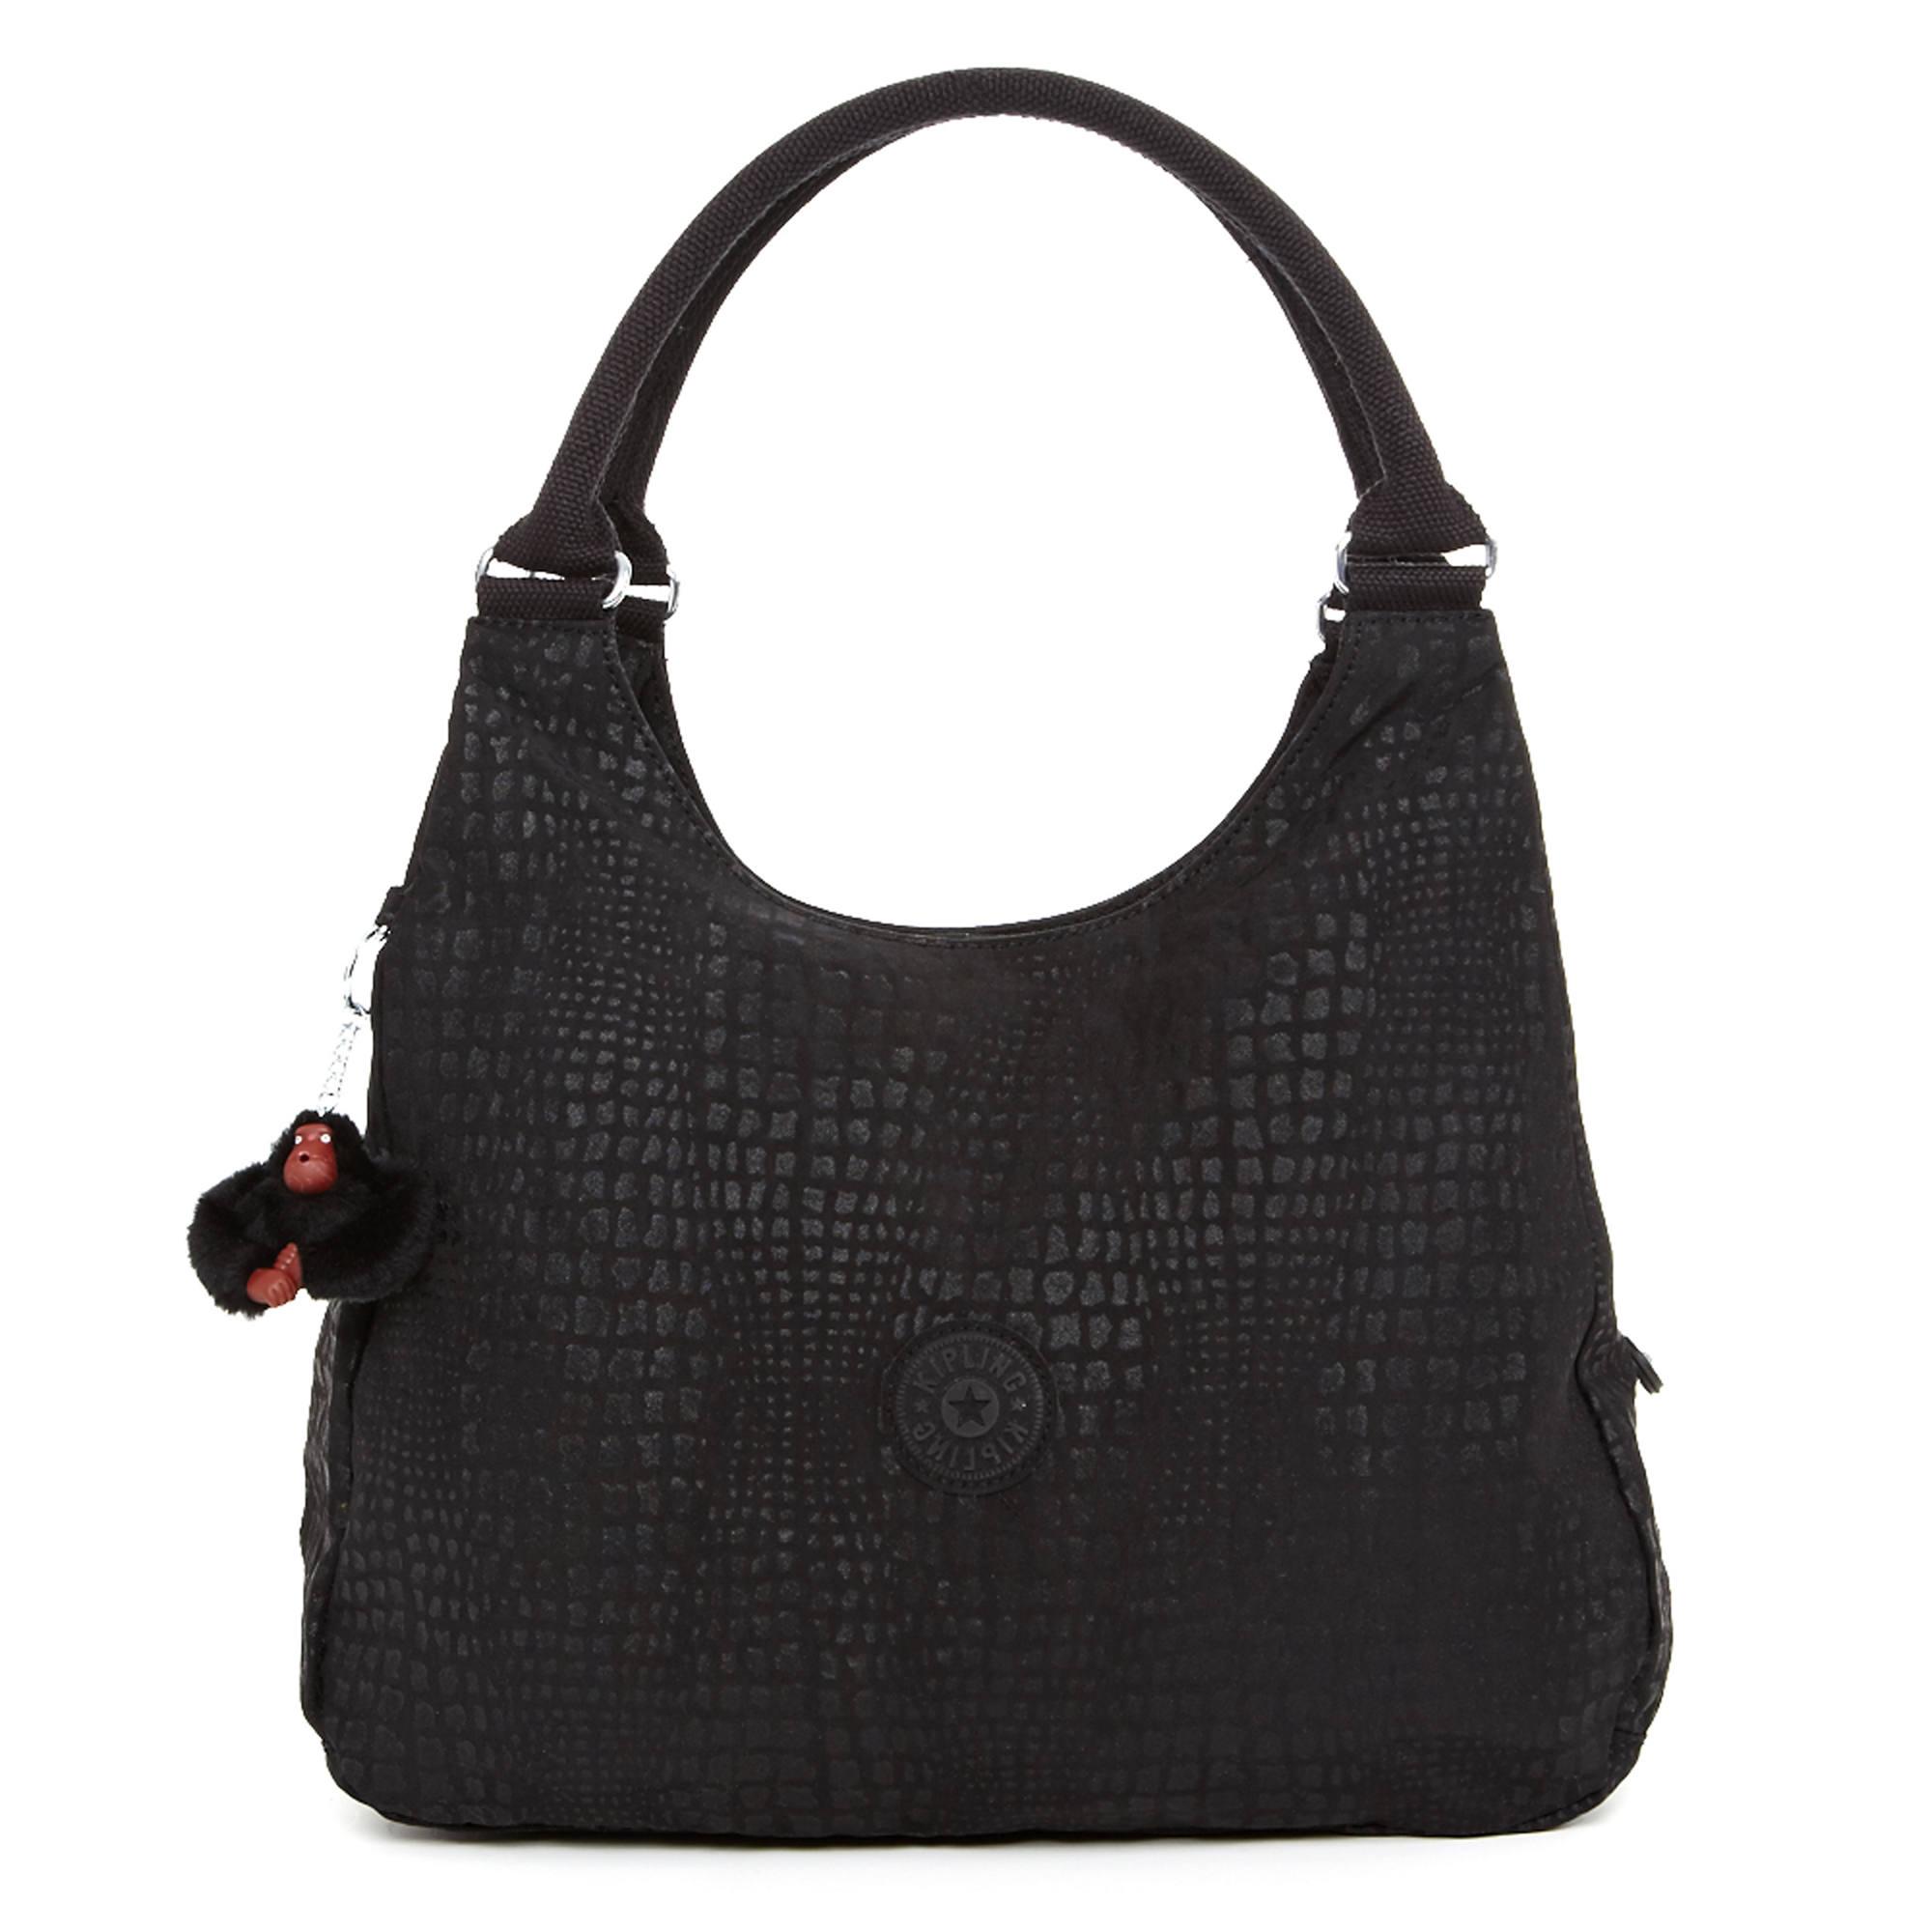 0b500ae7d Bagsational Handbag,True Dazz Black,large